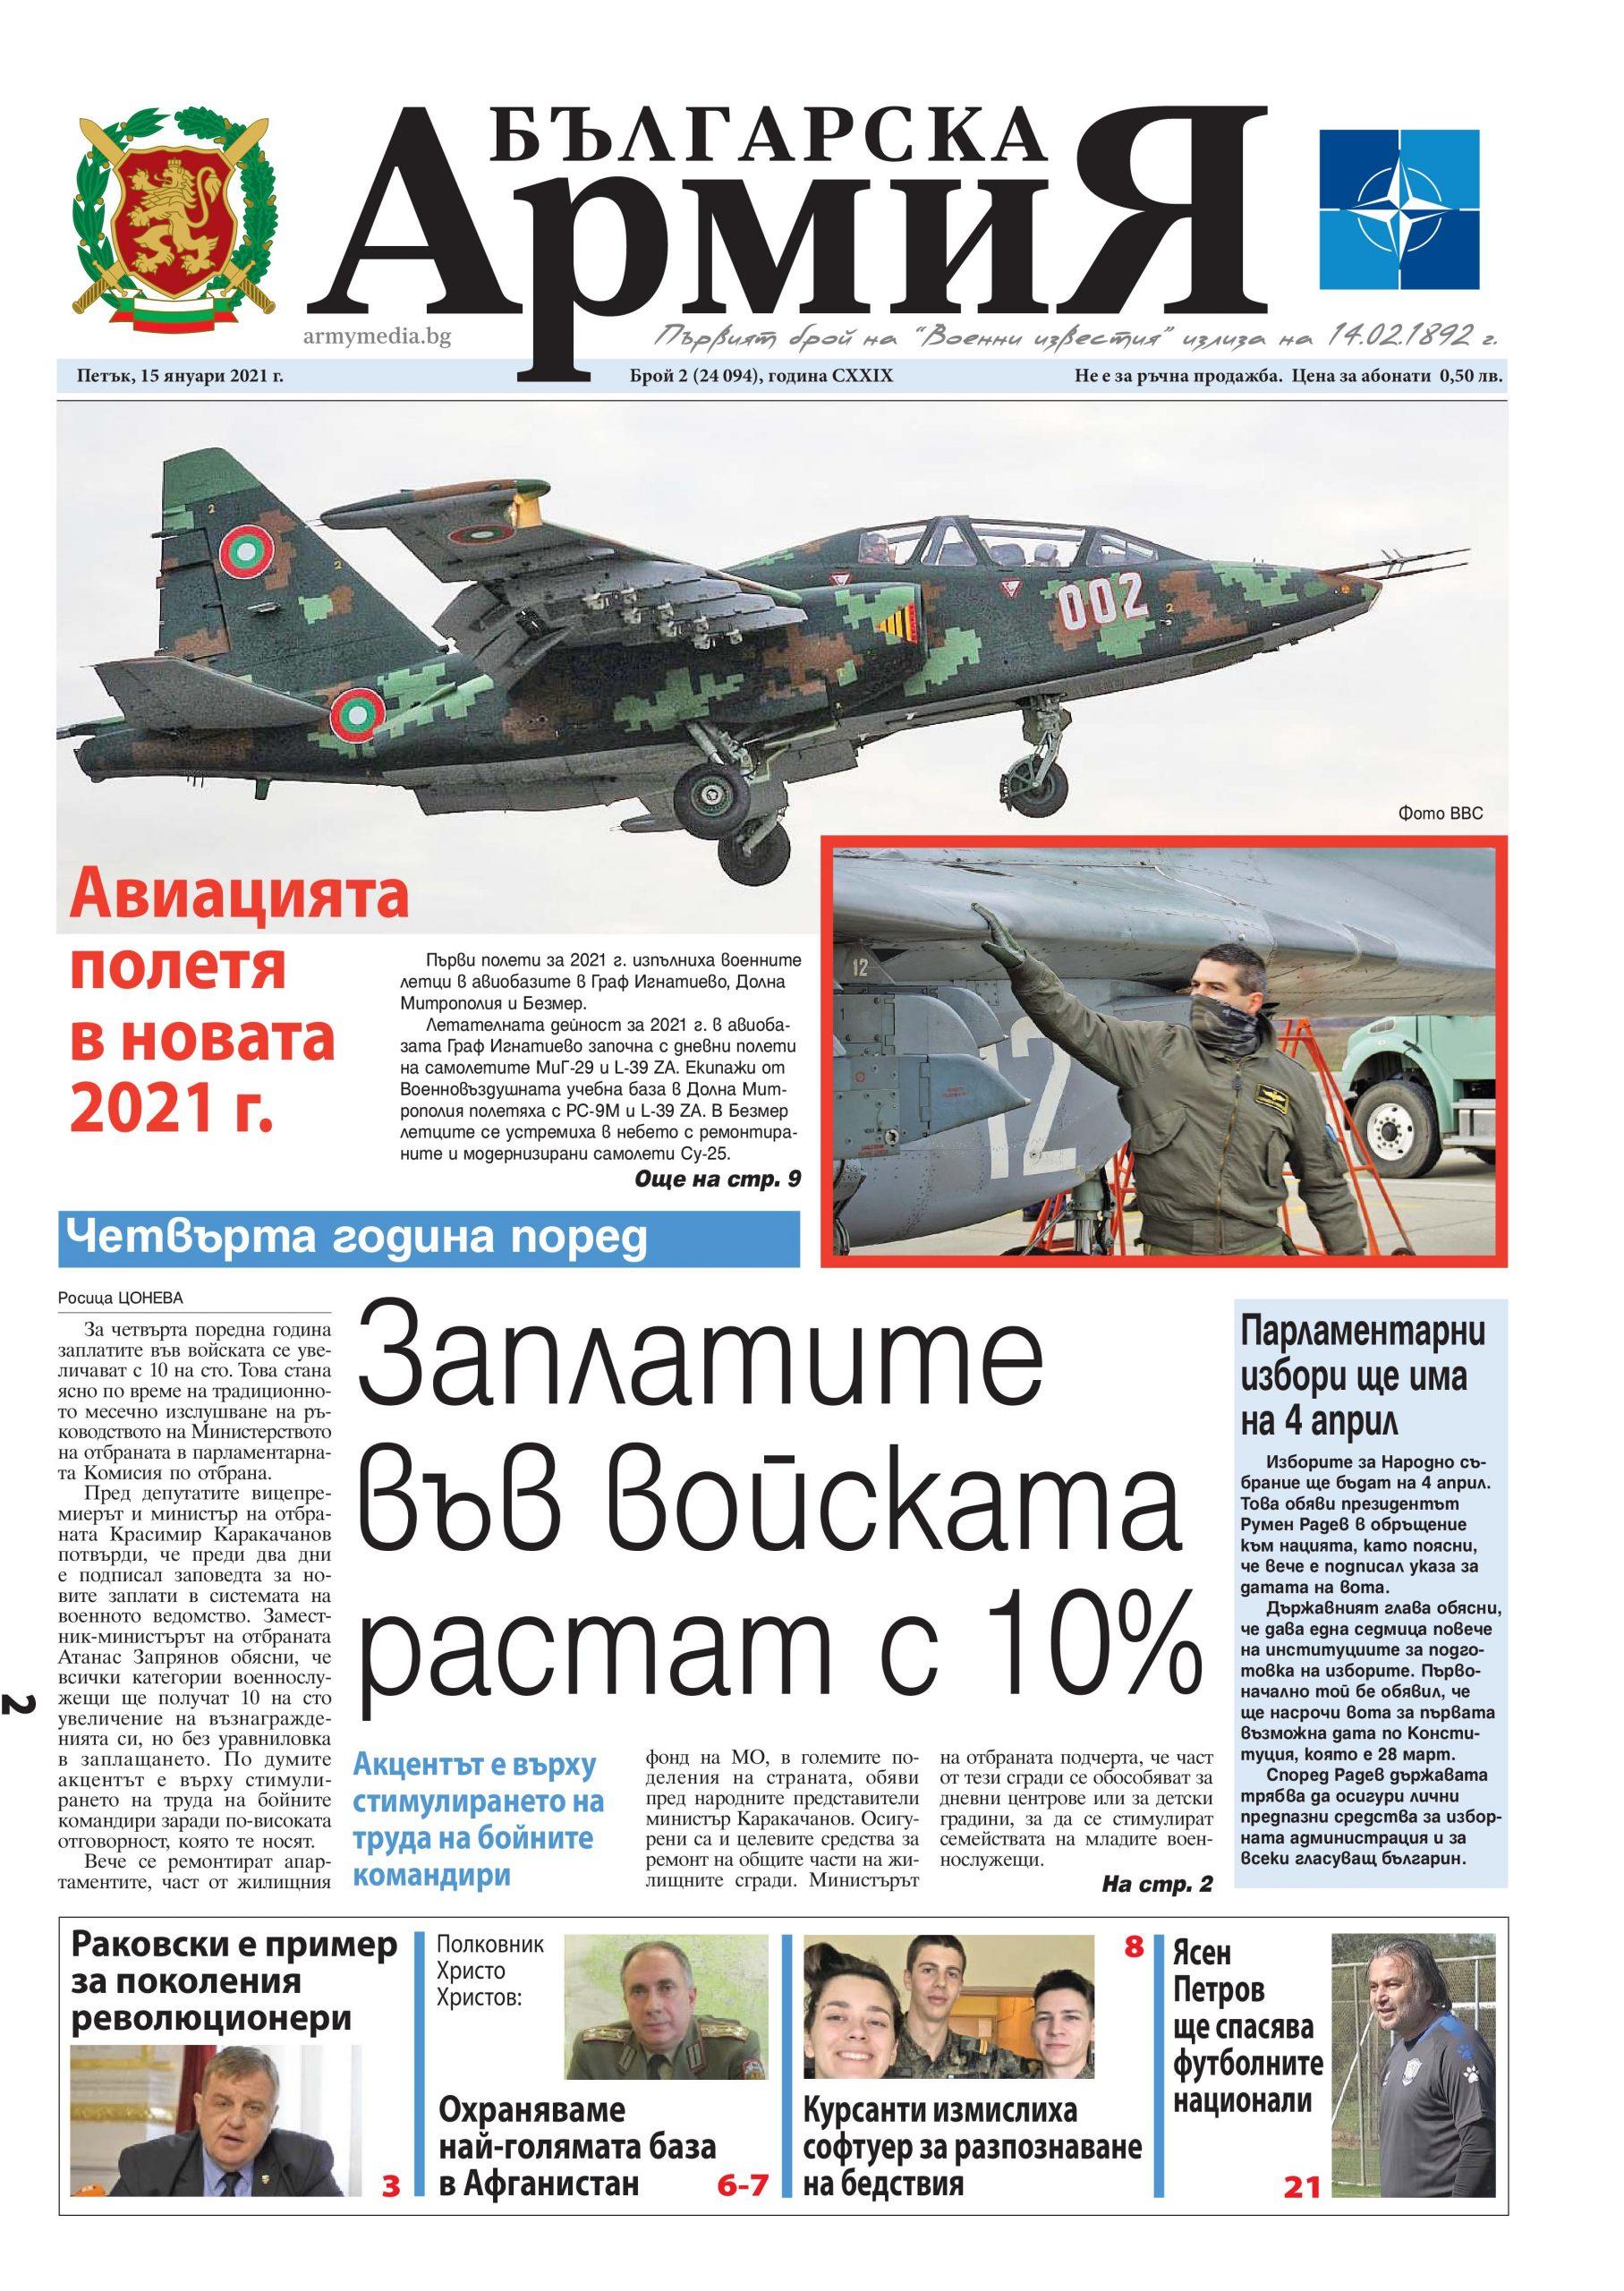 https://armymedia.bg/wp-content/uploads/2015/06/01-55-scaled.jpg